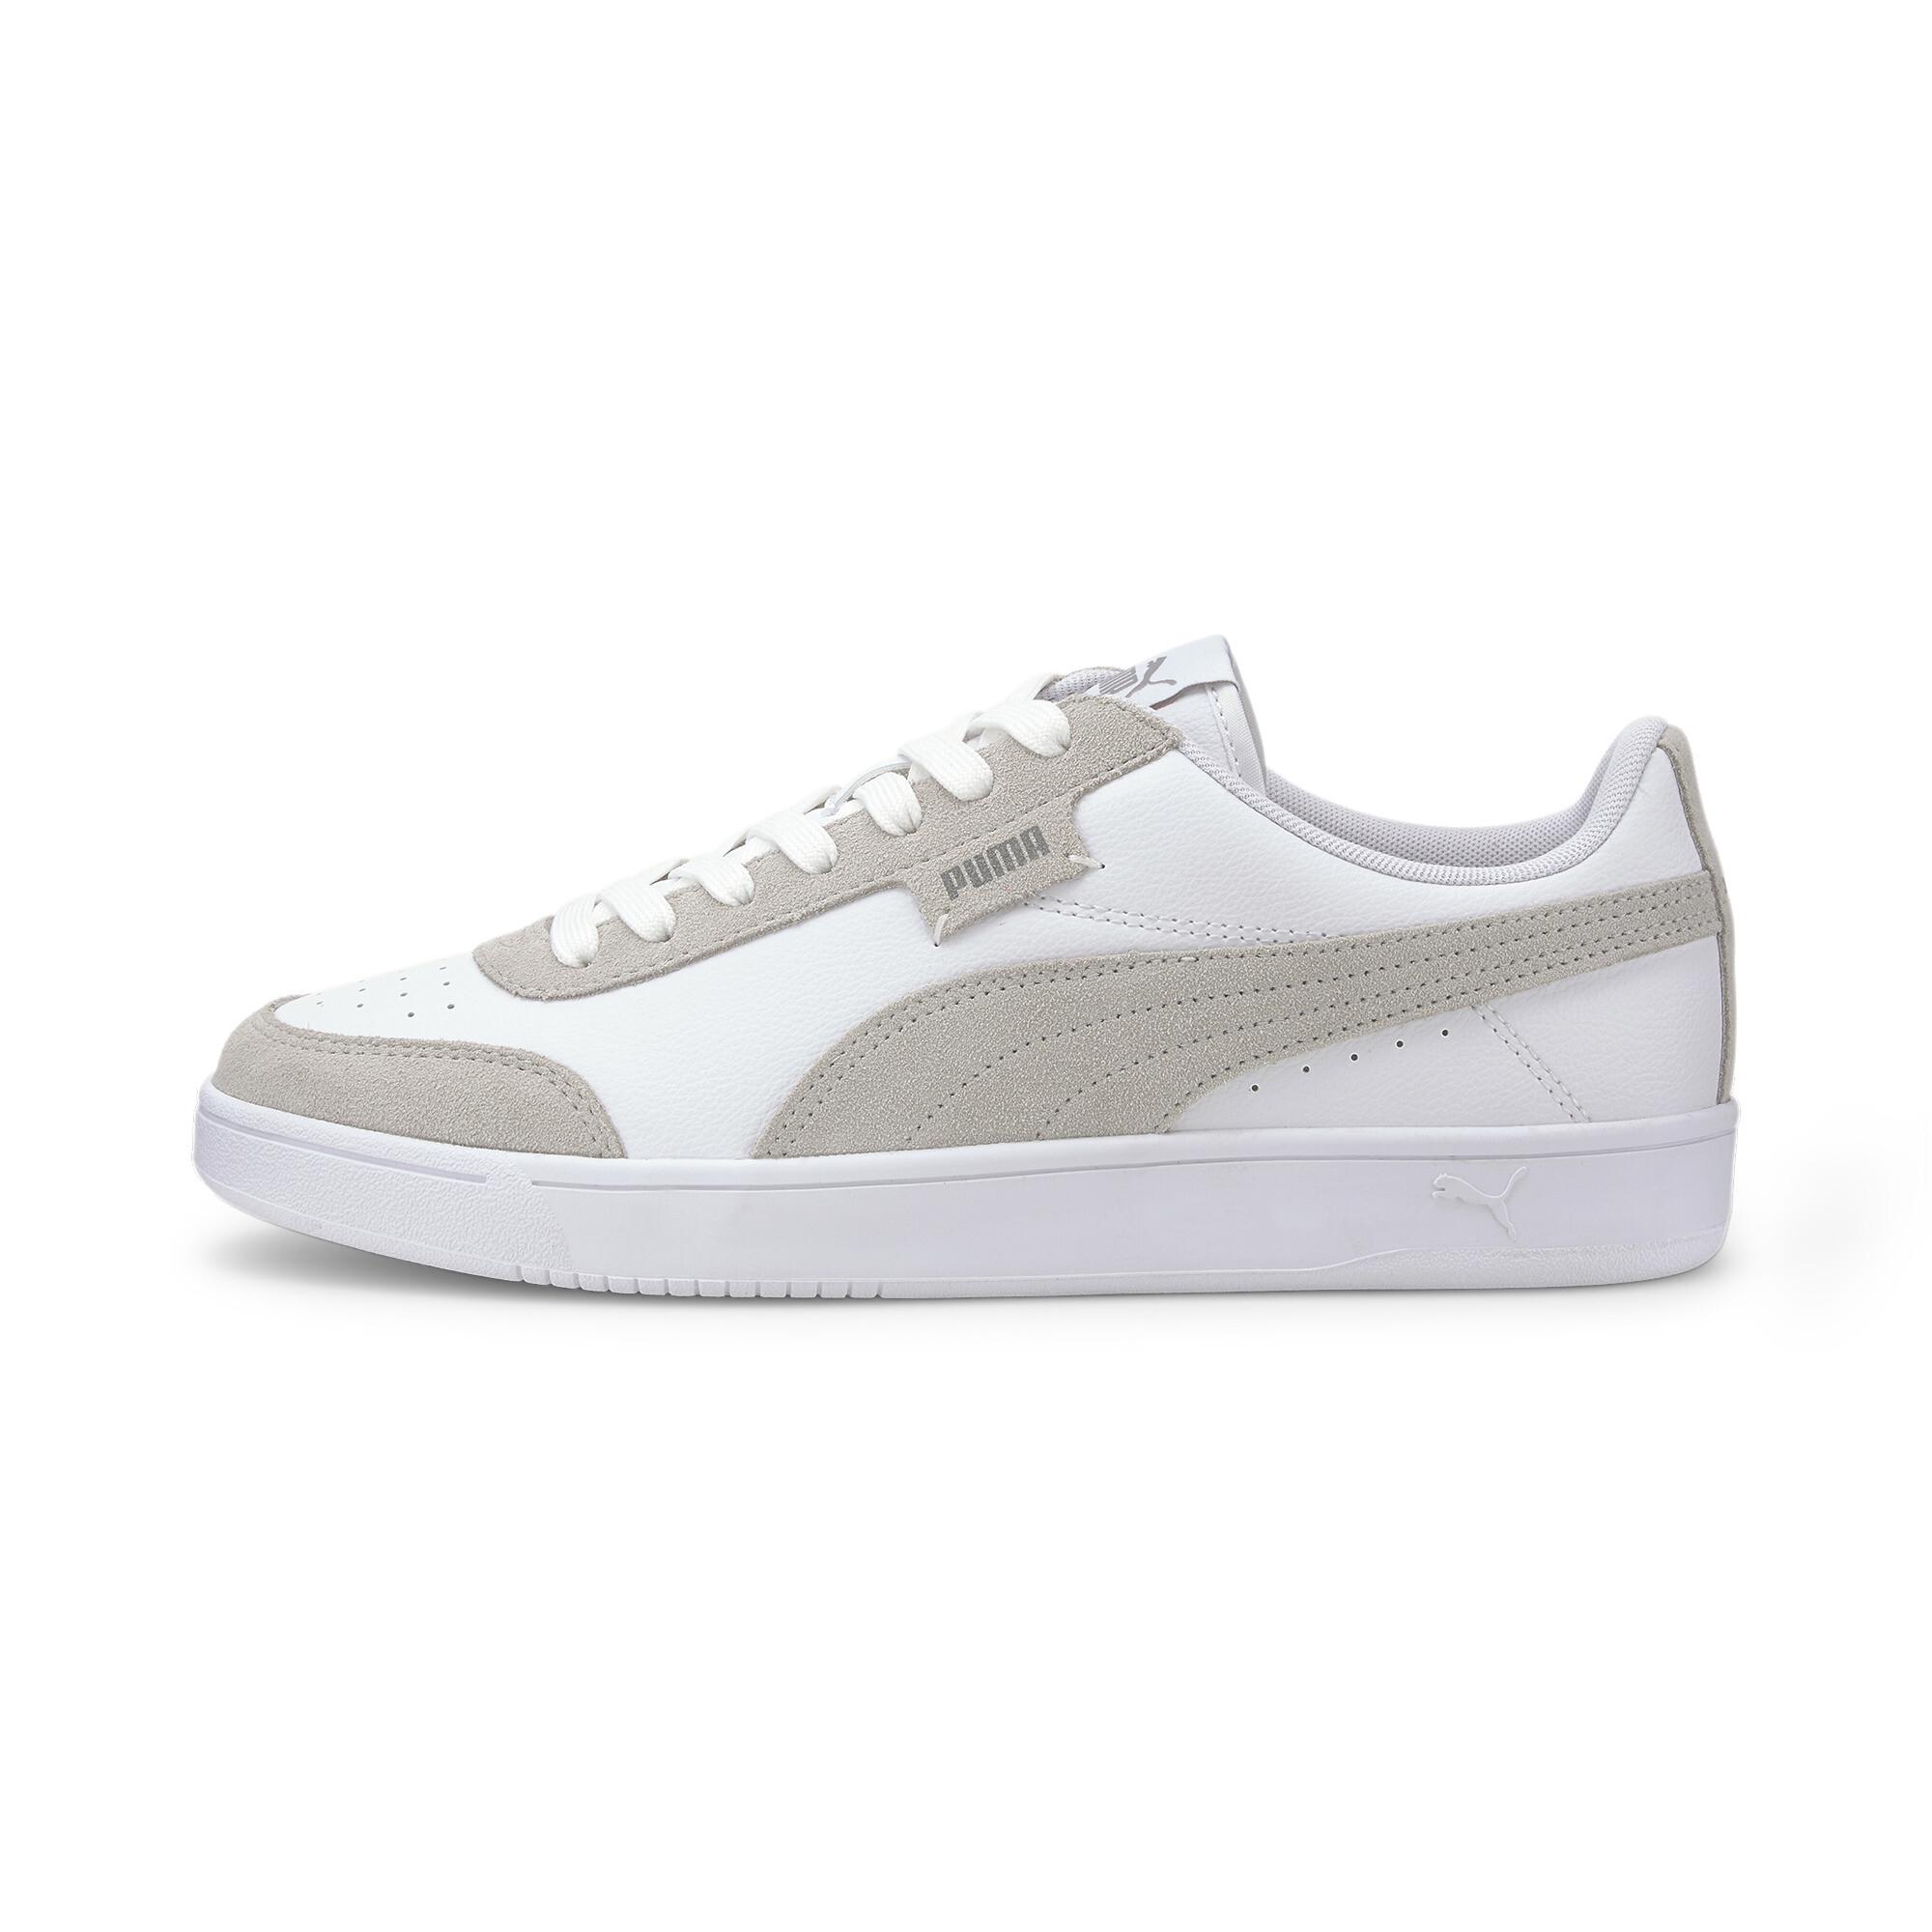 Indexbild 4 - PUMA Court Legend Lo Sneaker Unisex Schuhe Basics Neu